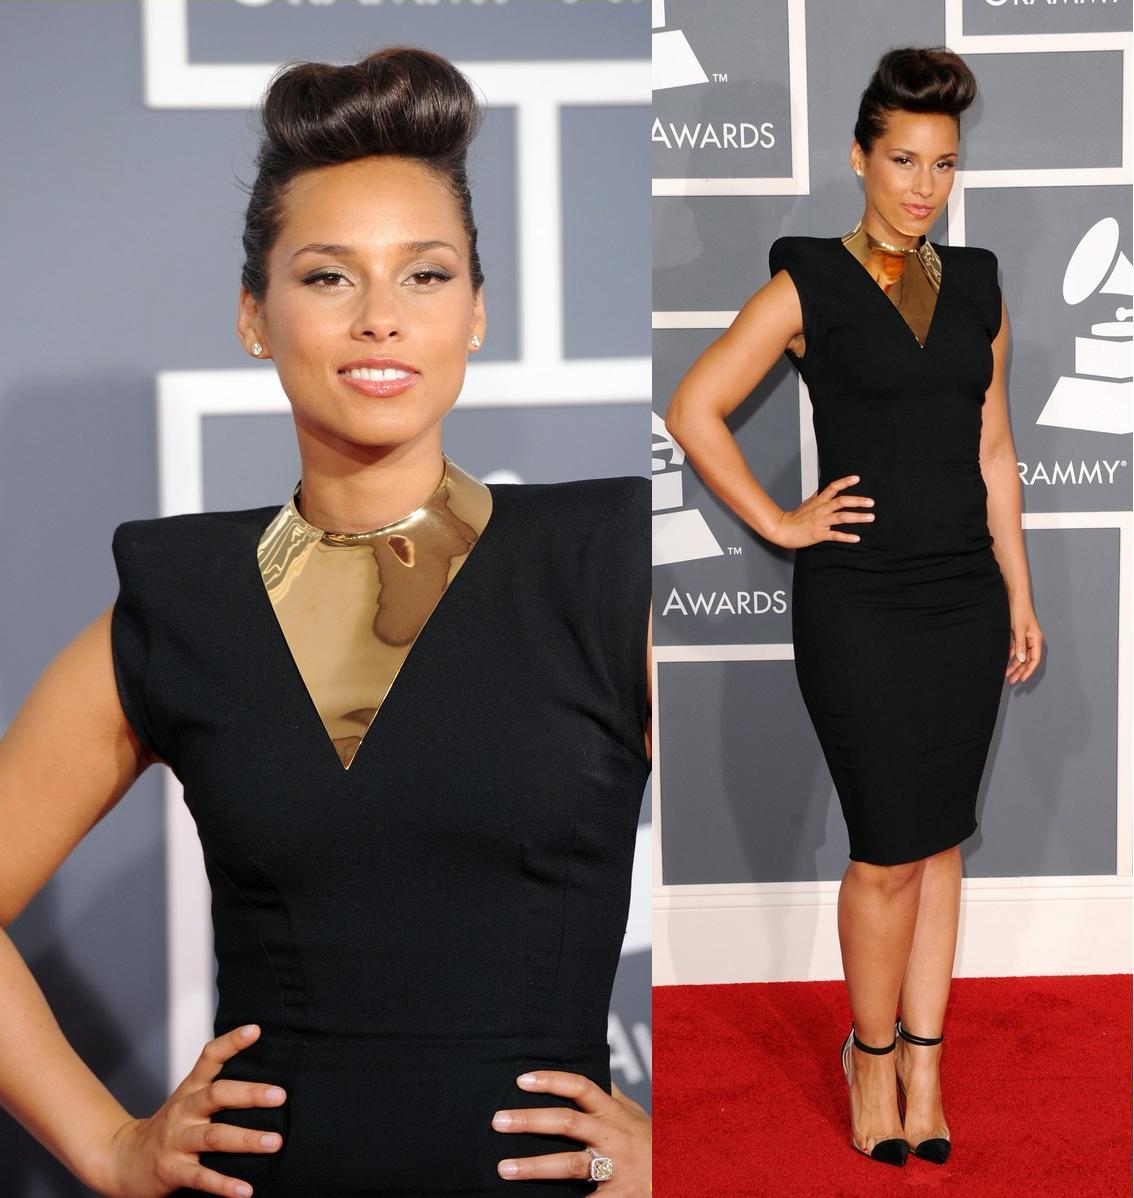 http://2.bp.blogspot.com/-rsGGJEwuTm8/Tzp1N8tKbcI/AAAAAAAAE3o/8SvjQYSNnNk/s1600/Alicia+Keys+in+Alexandre+Vauthier+-+2012+Grammys.jpg